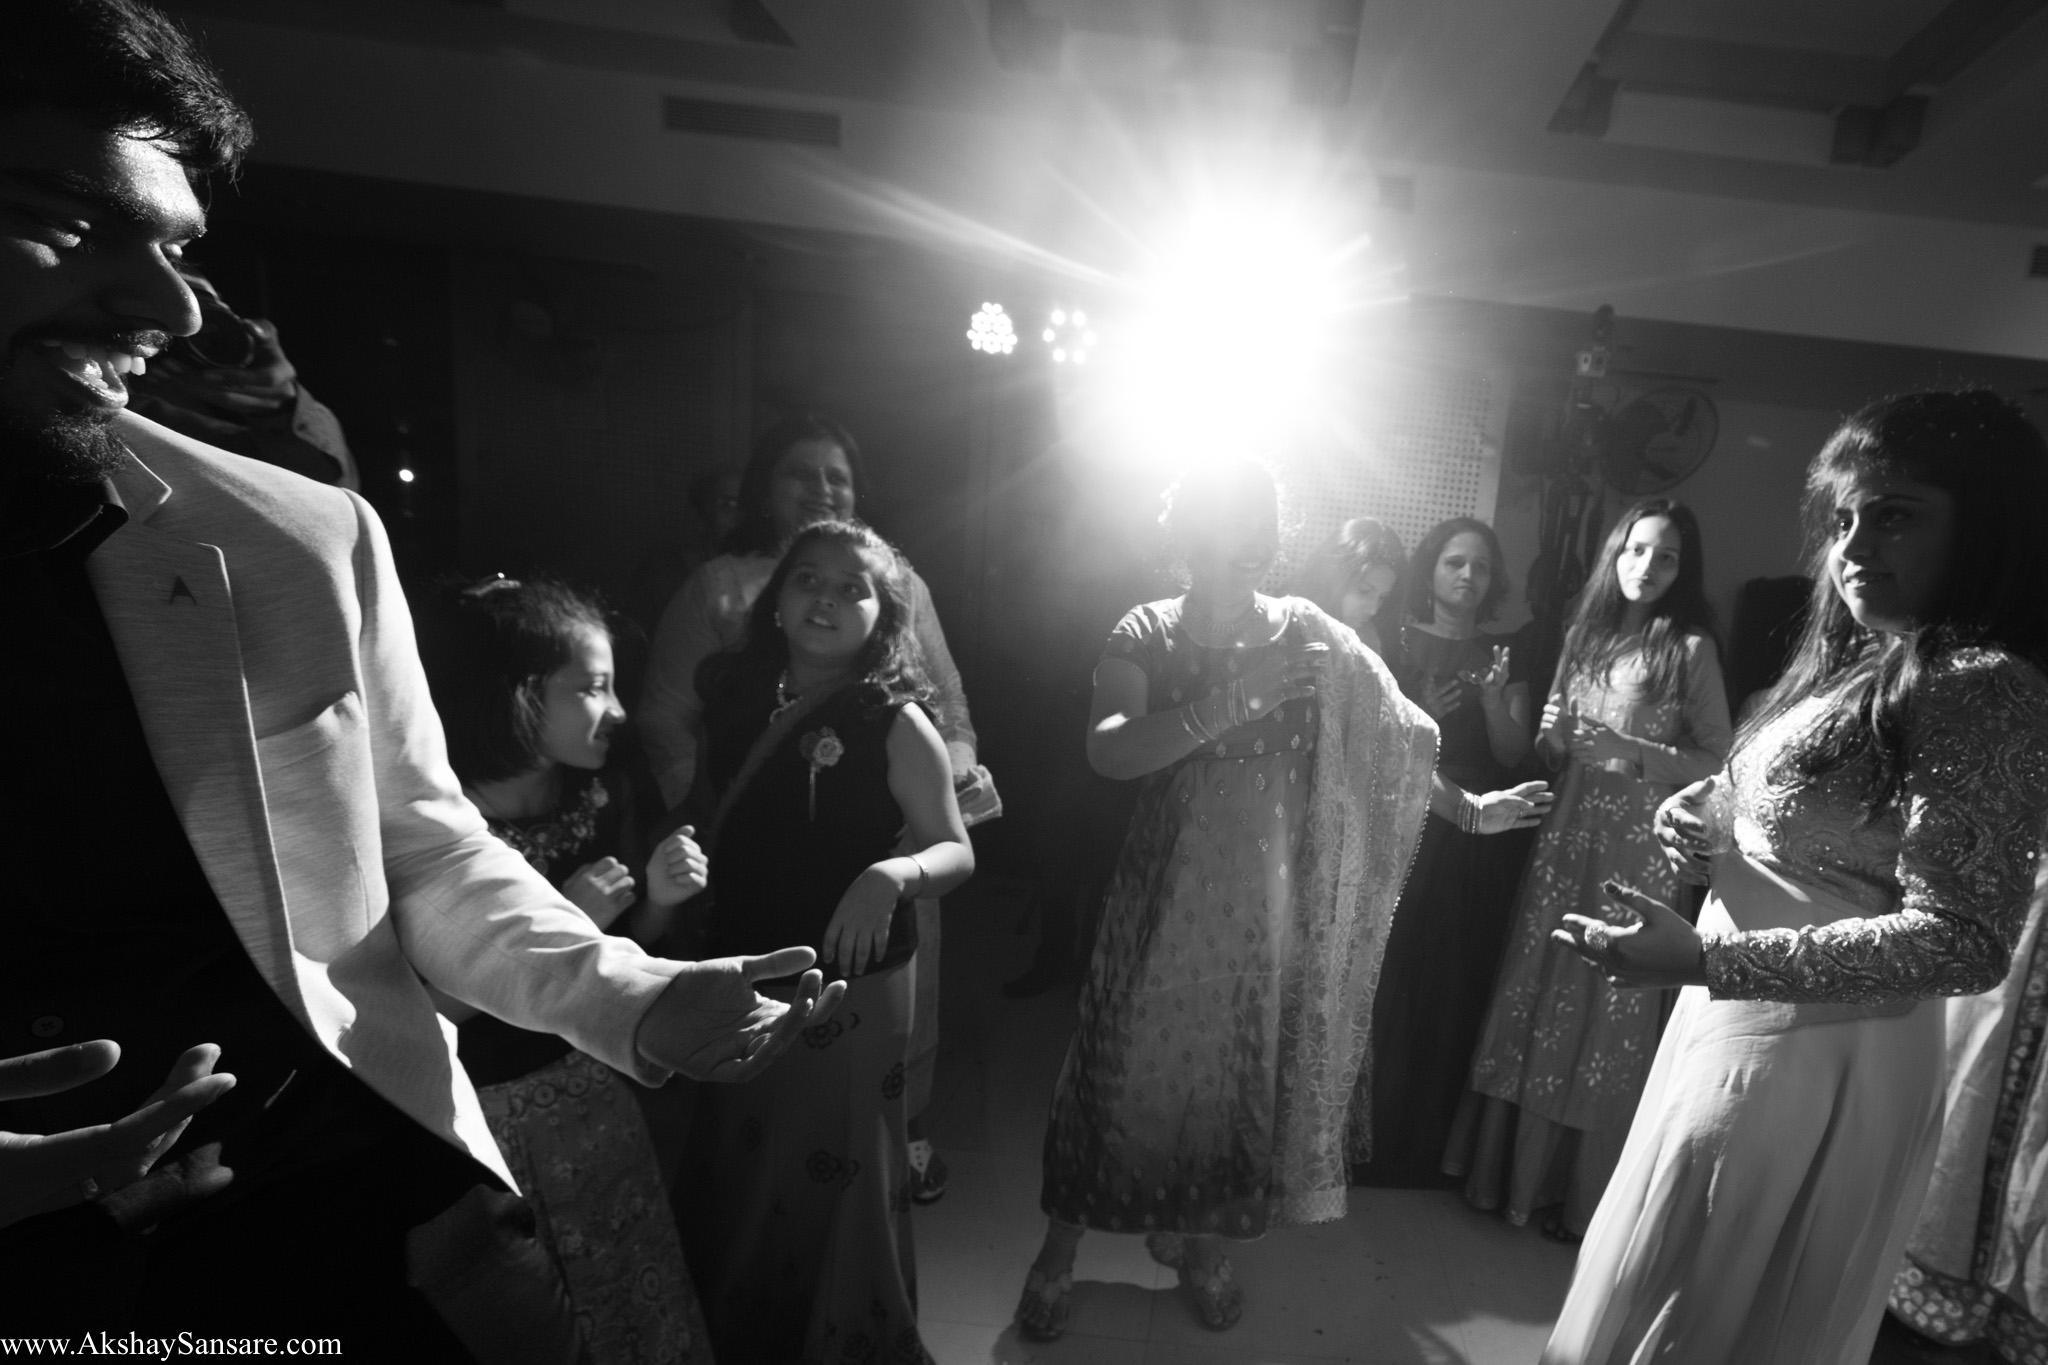 Akshay Sansare Best Candid Photographers in Mumbai (10).jpg